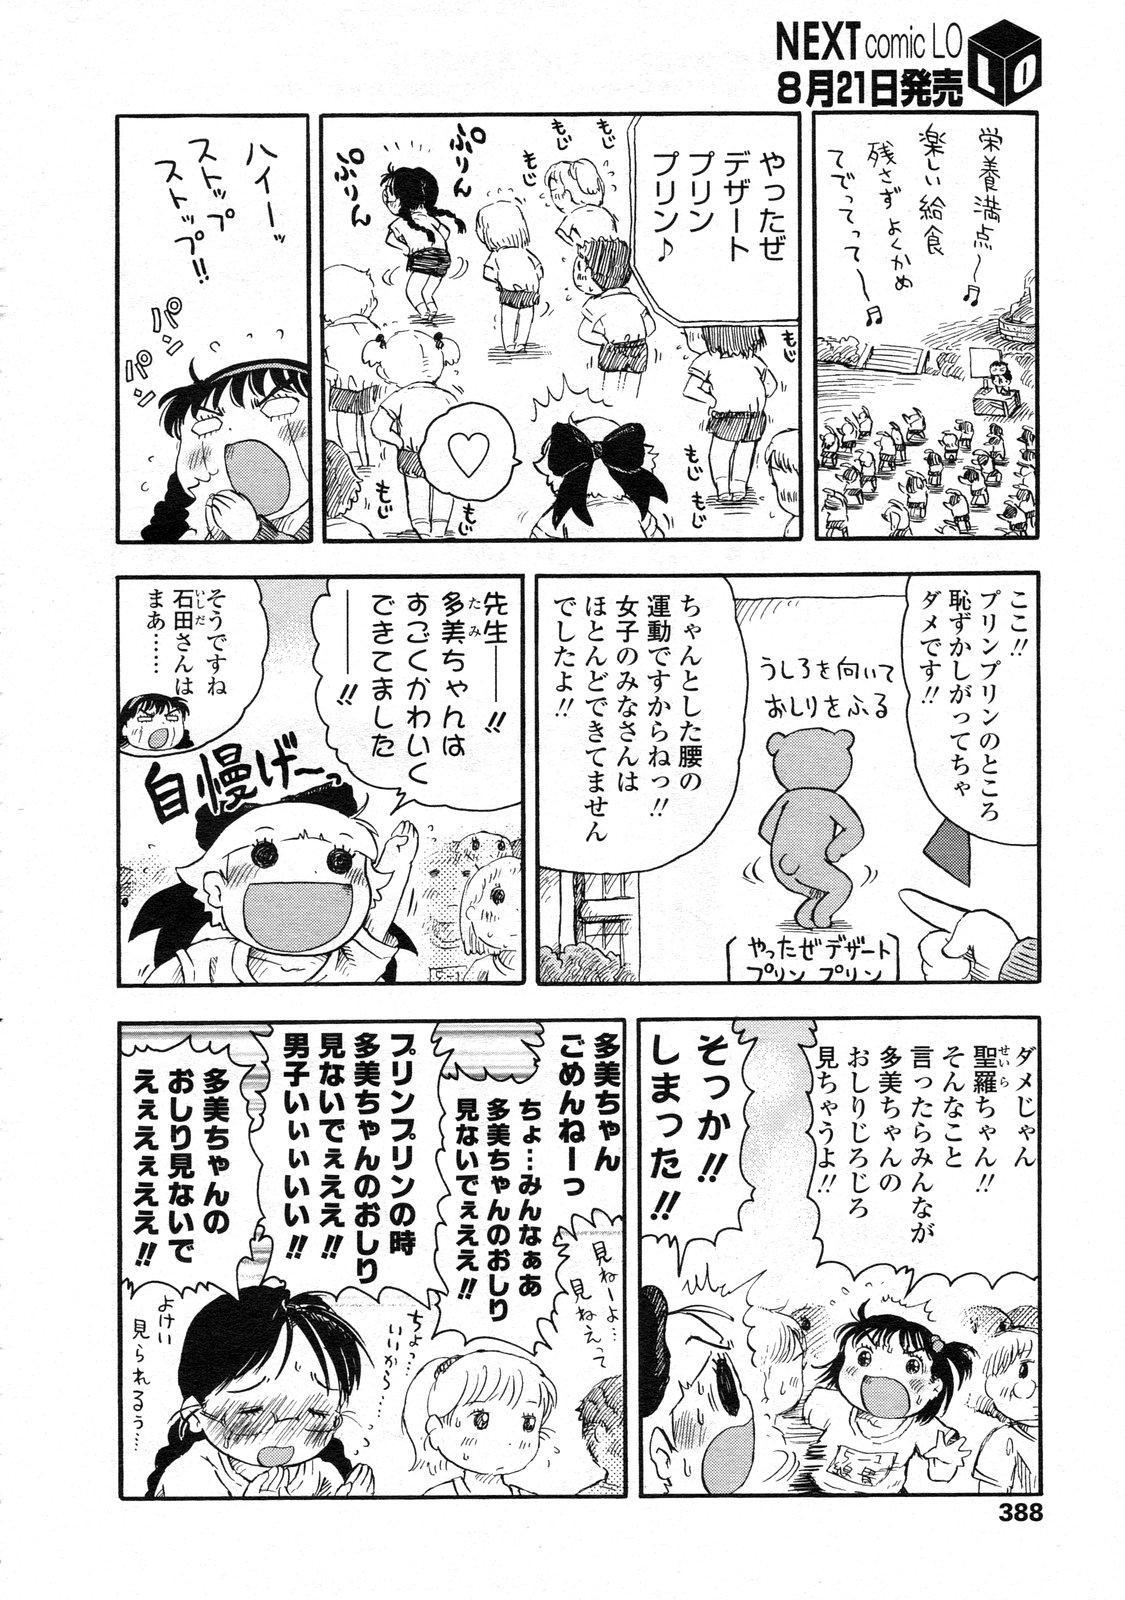 COMIC LO 2009-09 Vol. 66 388